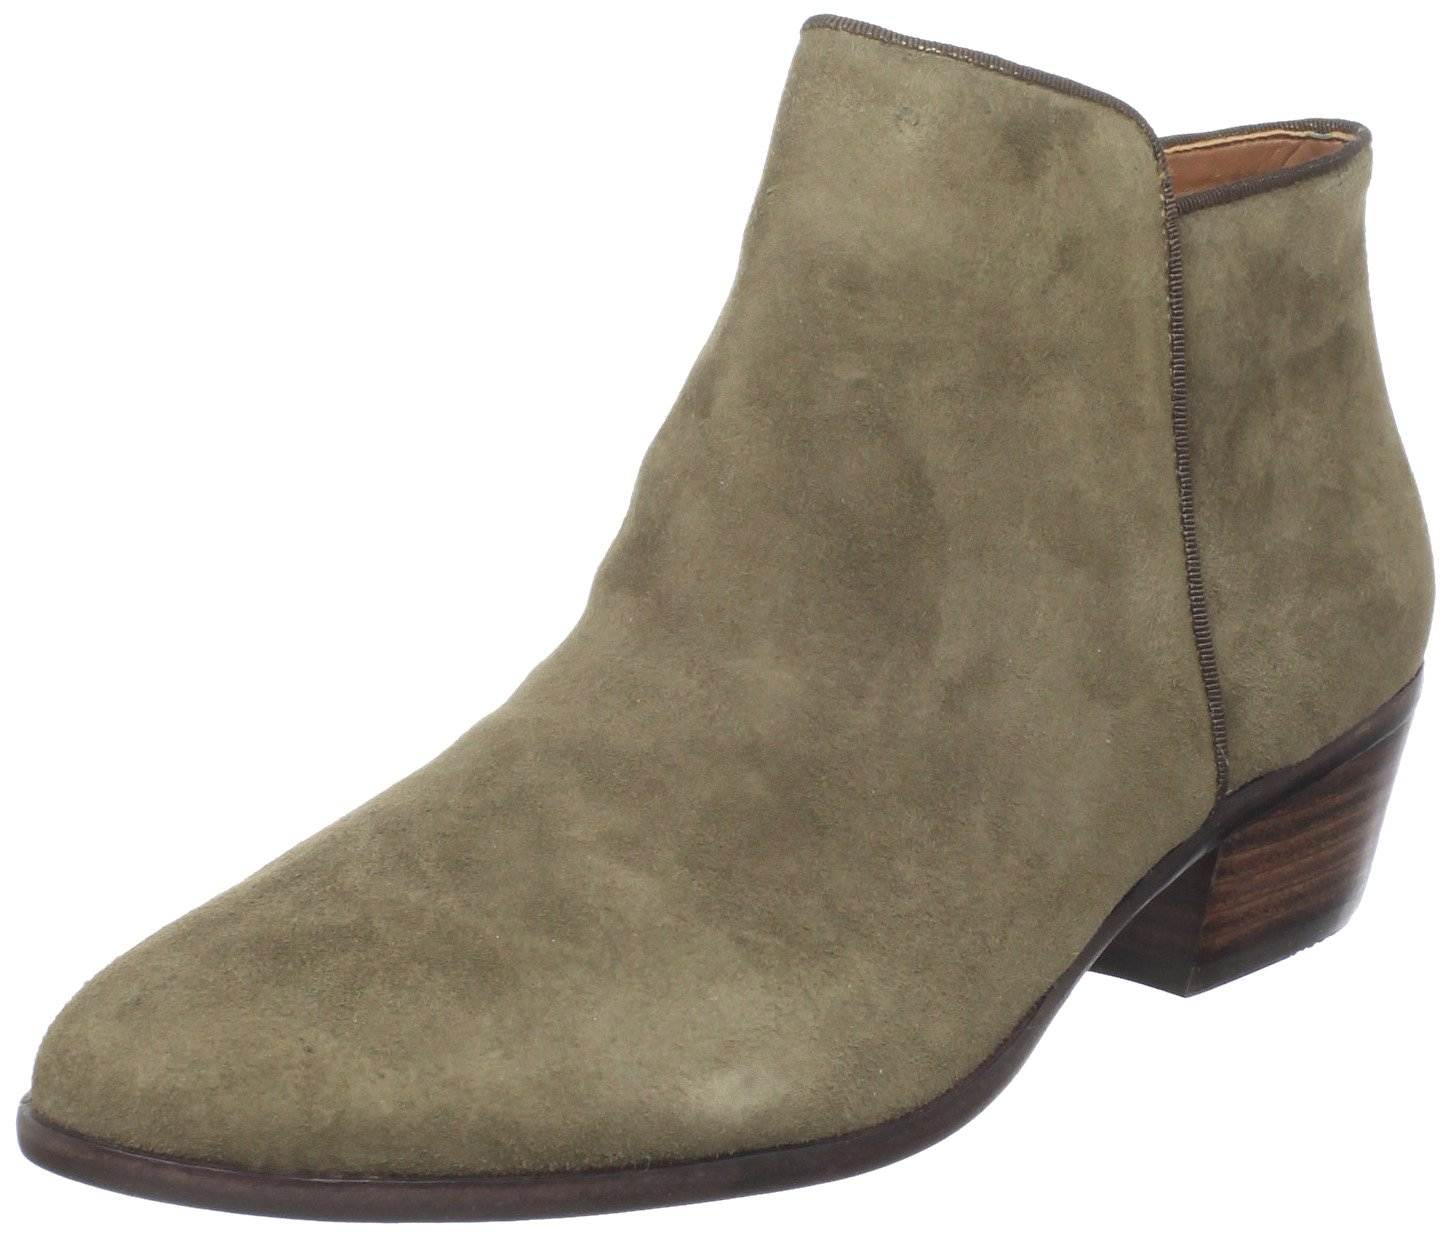 Sam Edelman Women's Petty Ankle Boot B004I59YJG 6 B(M) US|Moss Green